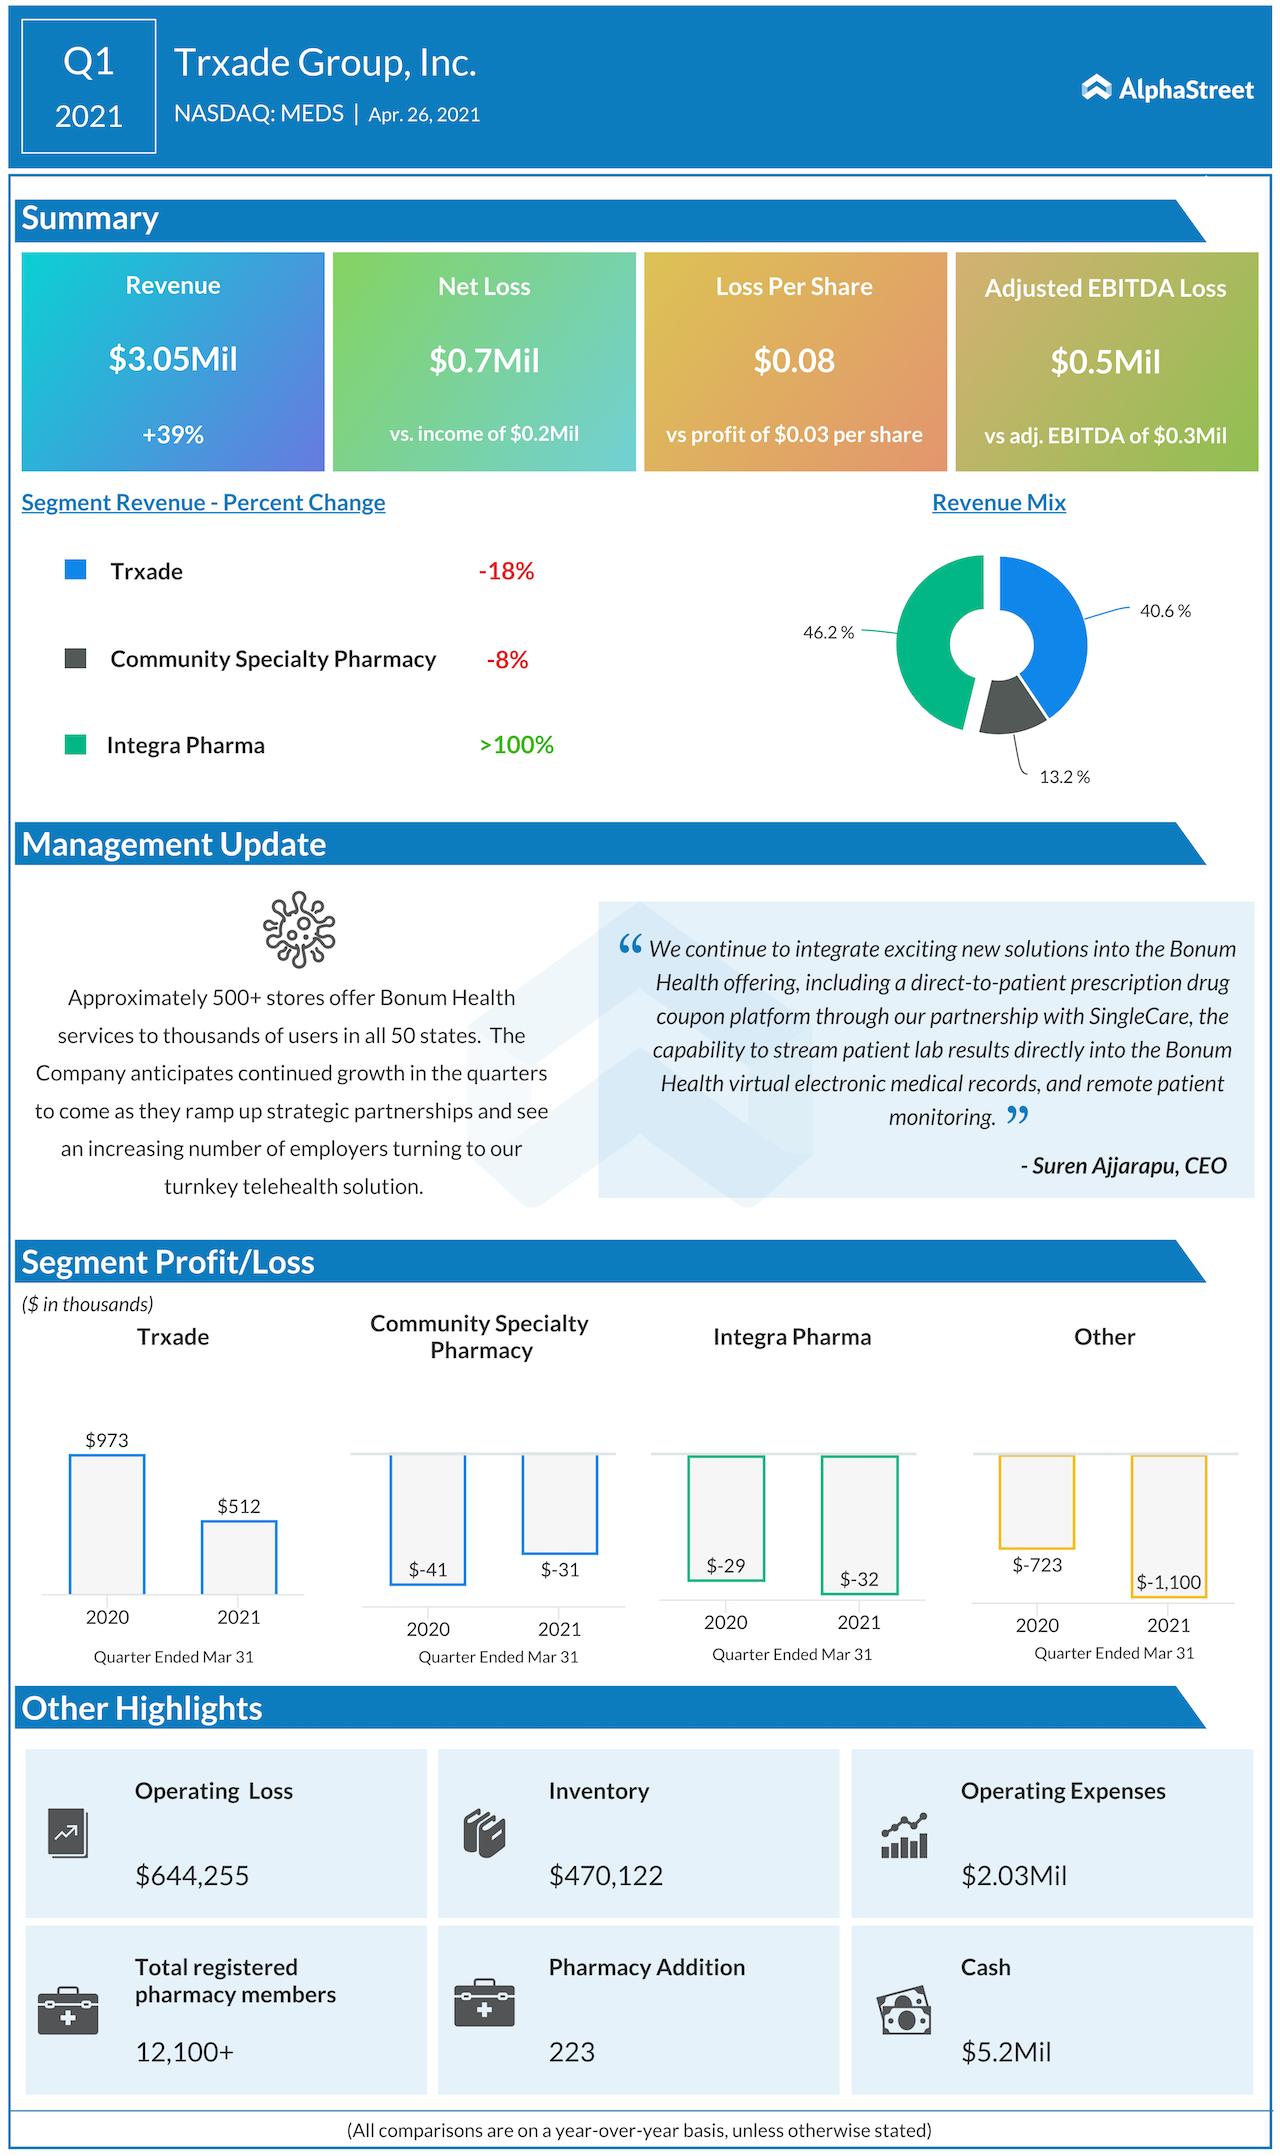 Trxade Q1 2021 earnings